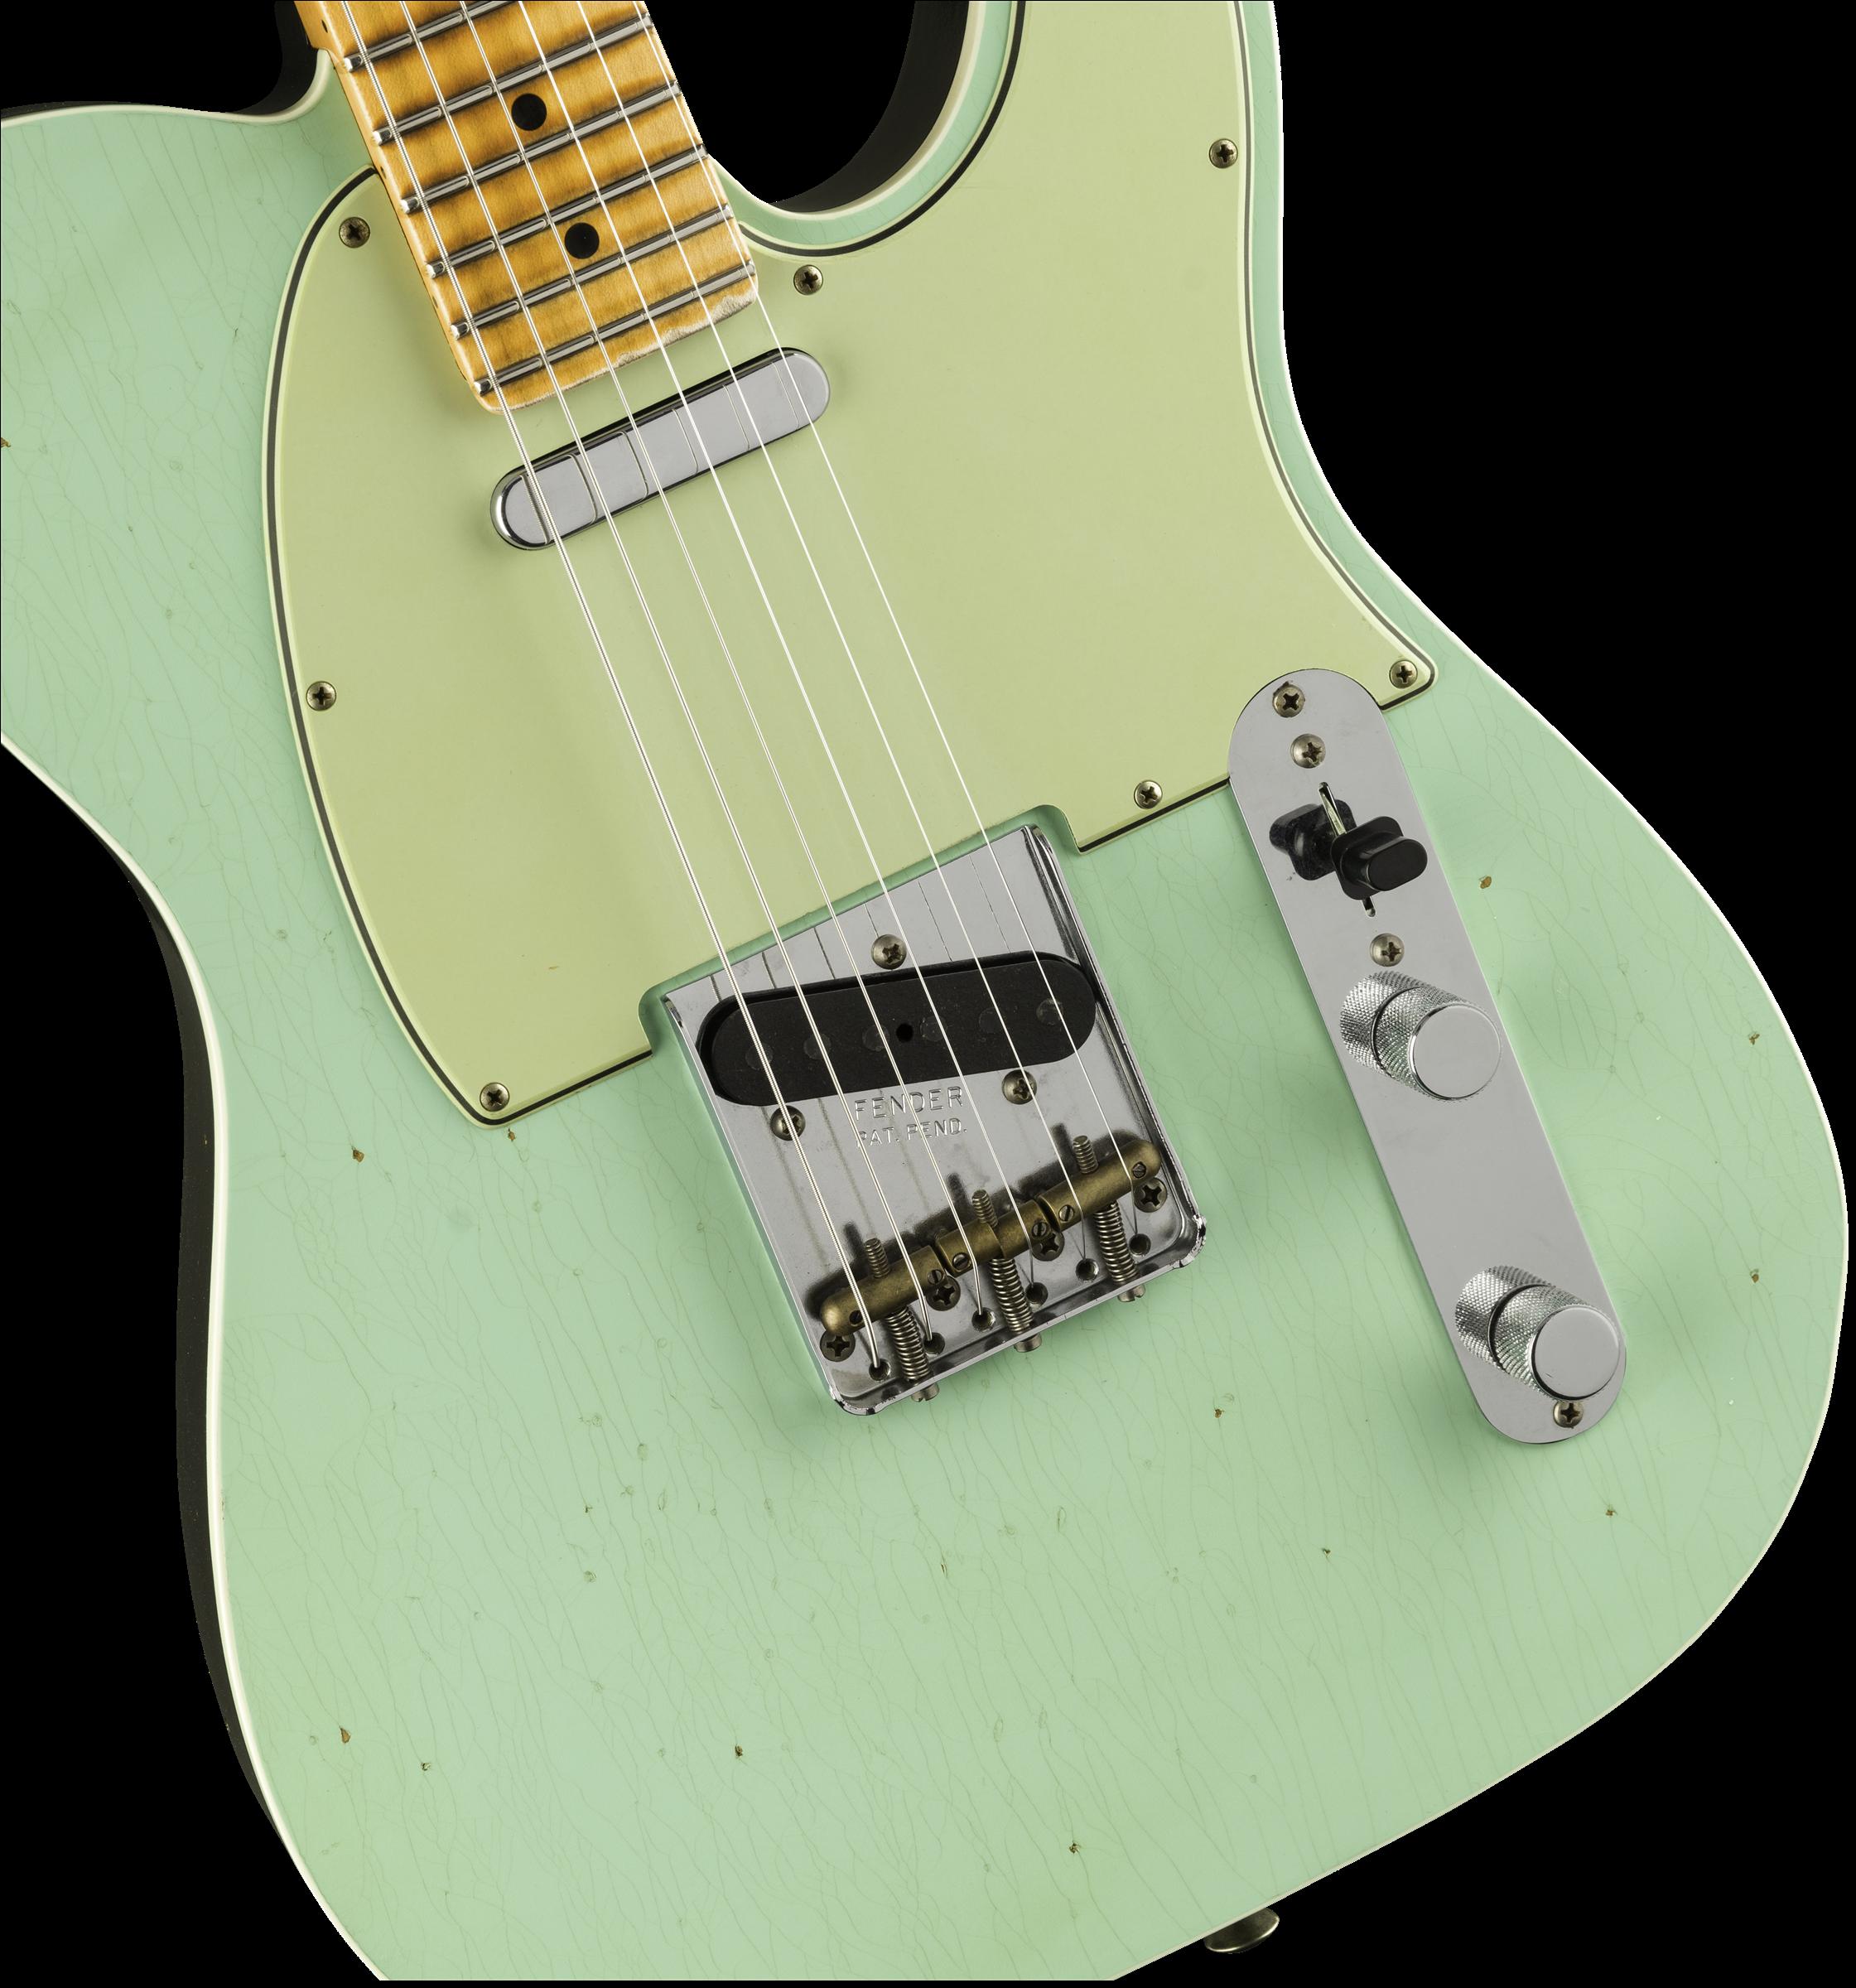 Fender Custom Shop Postmodern Telecaster Journeyman Relic Surf Green over  Black Electric Guitar